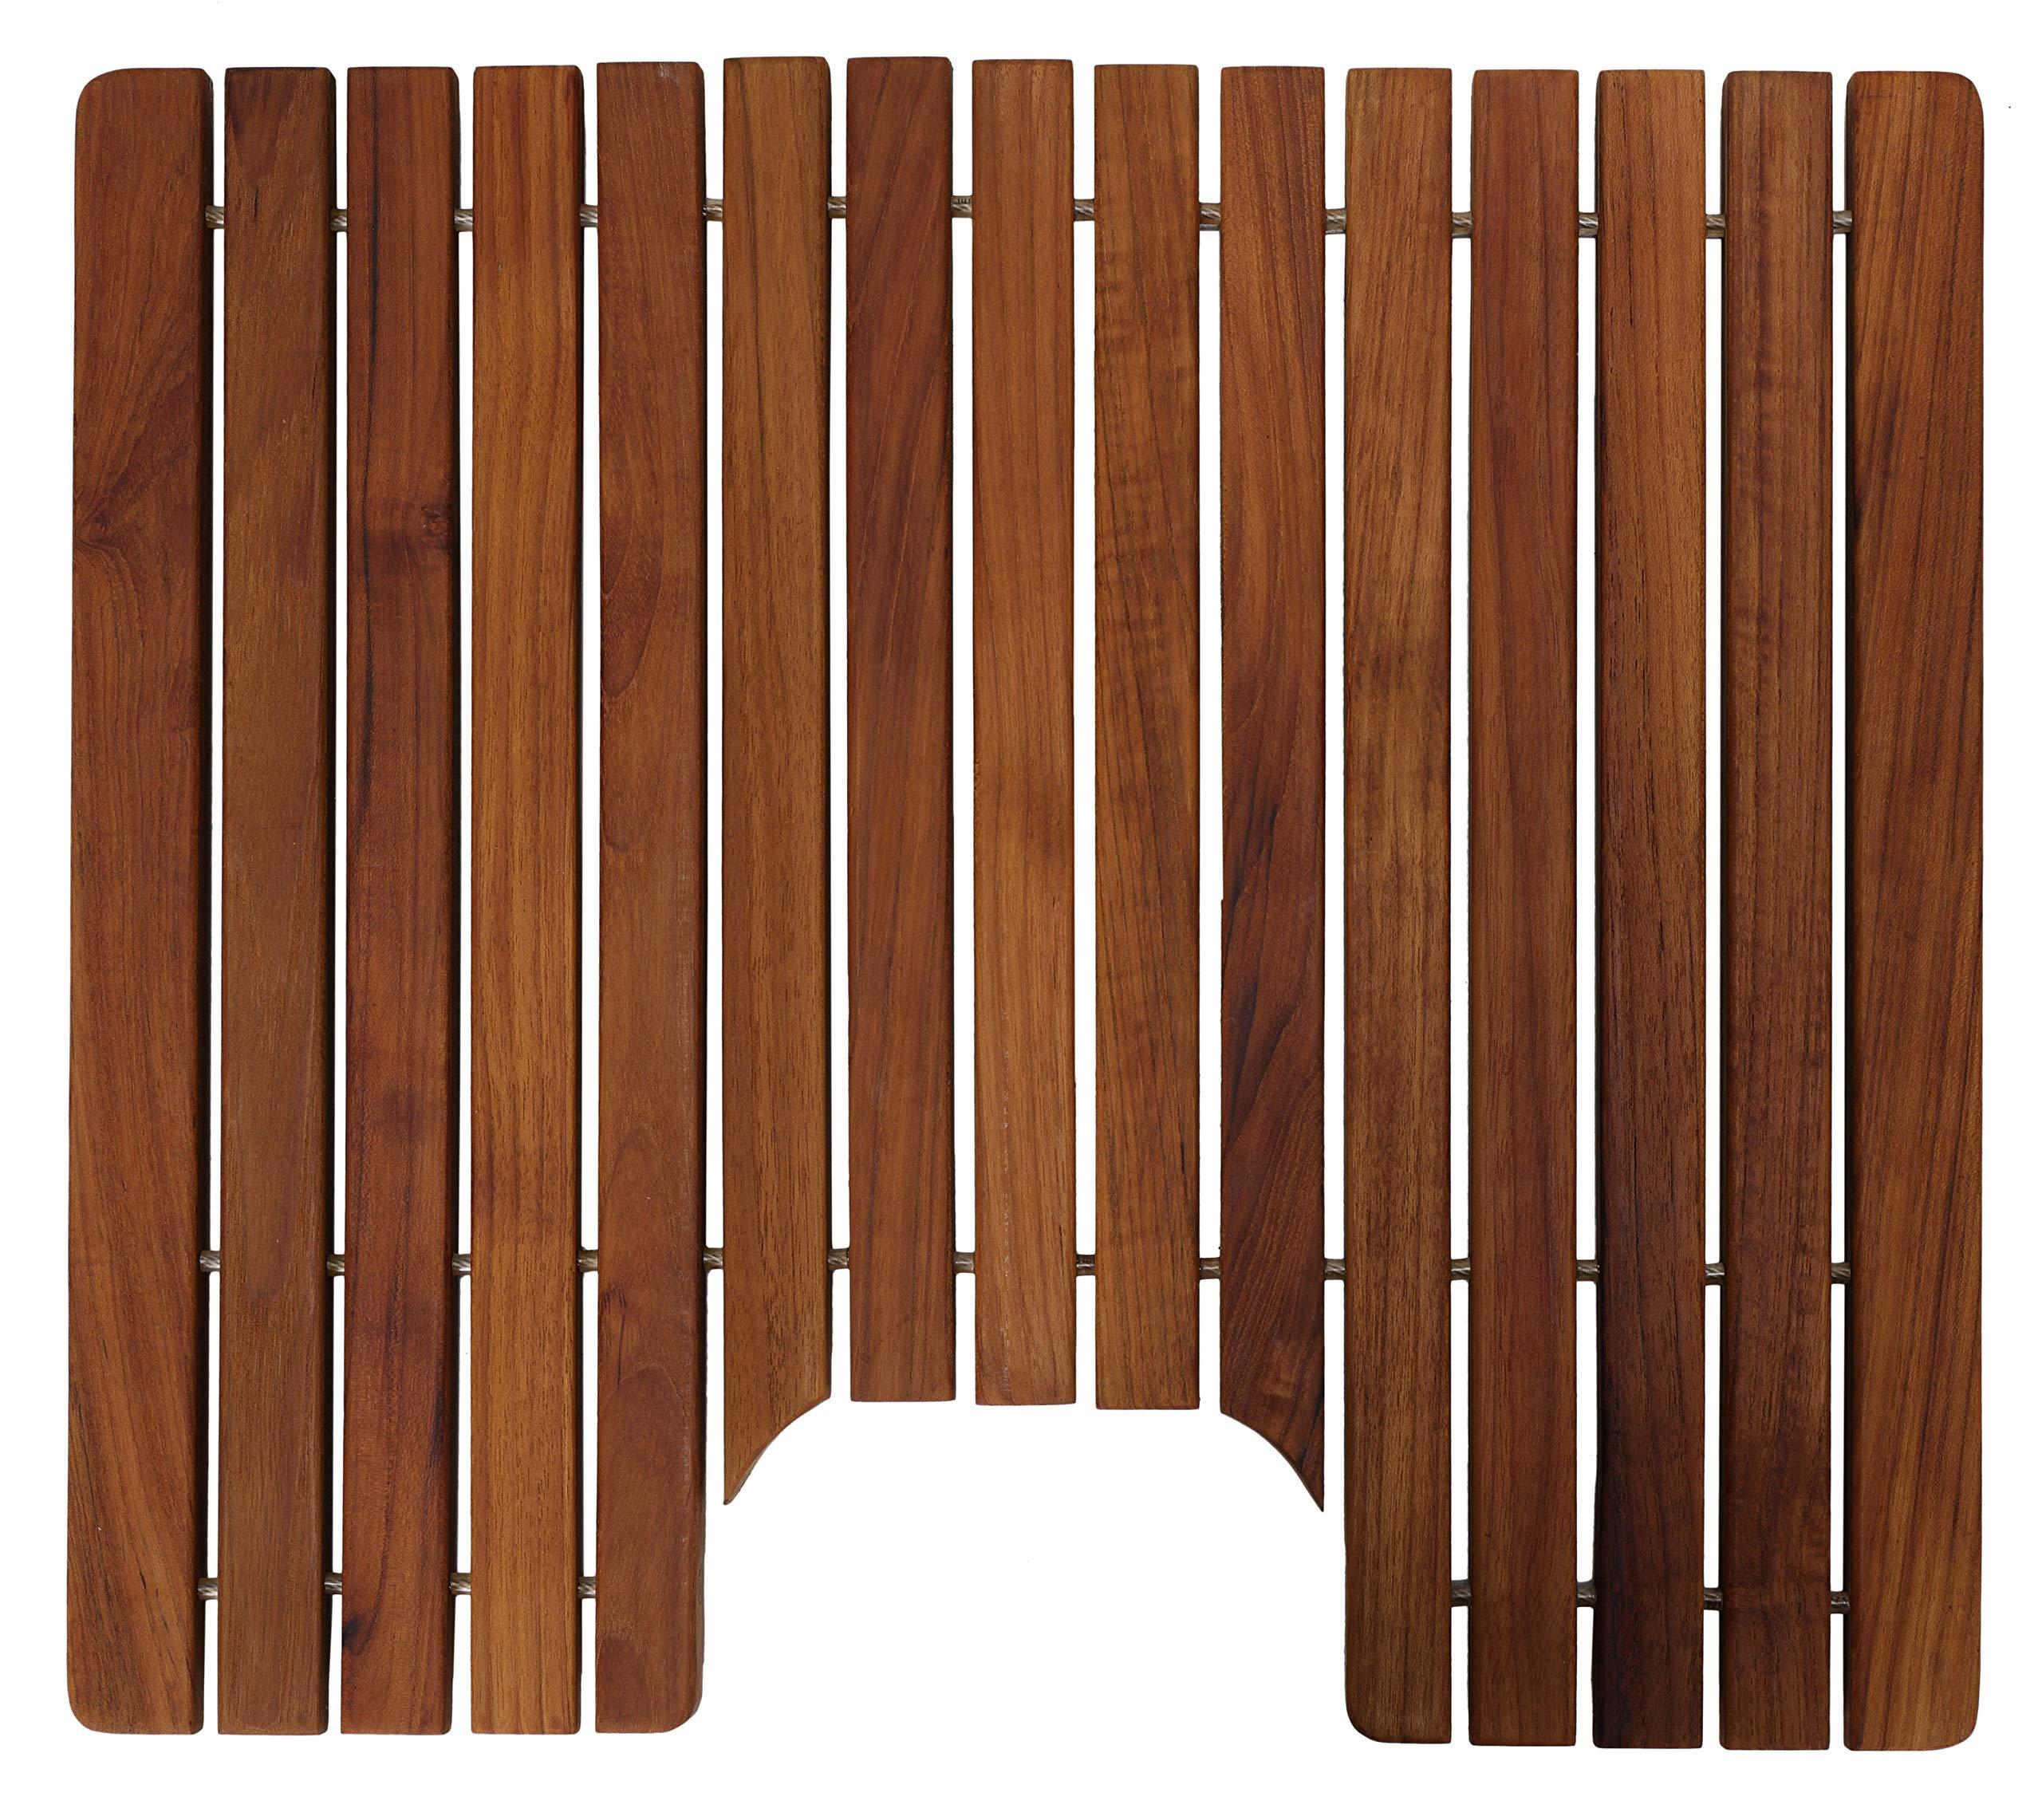 Bare Decor Peter Toilet Mat 20x18, Solid Teak Wood